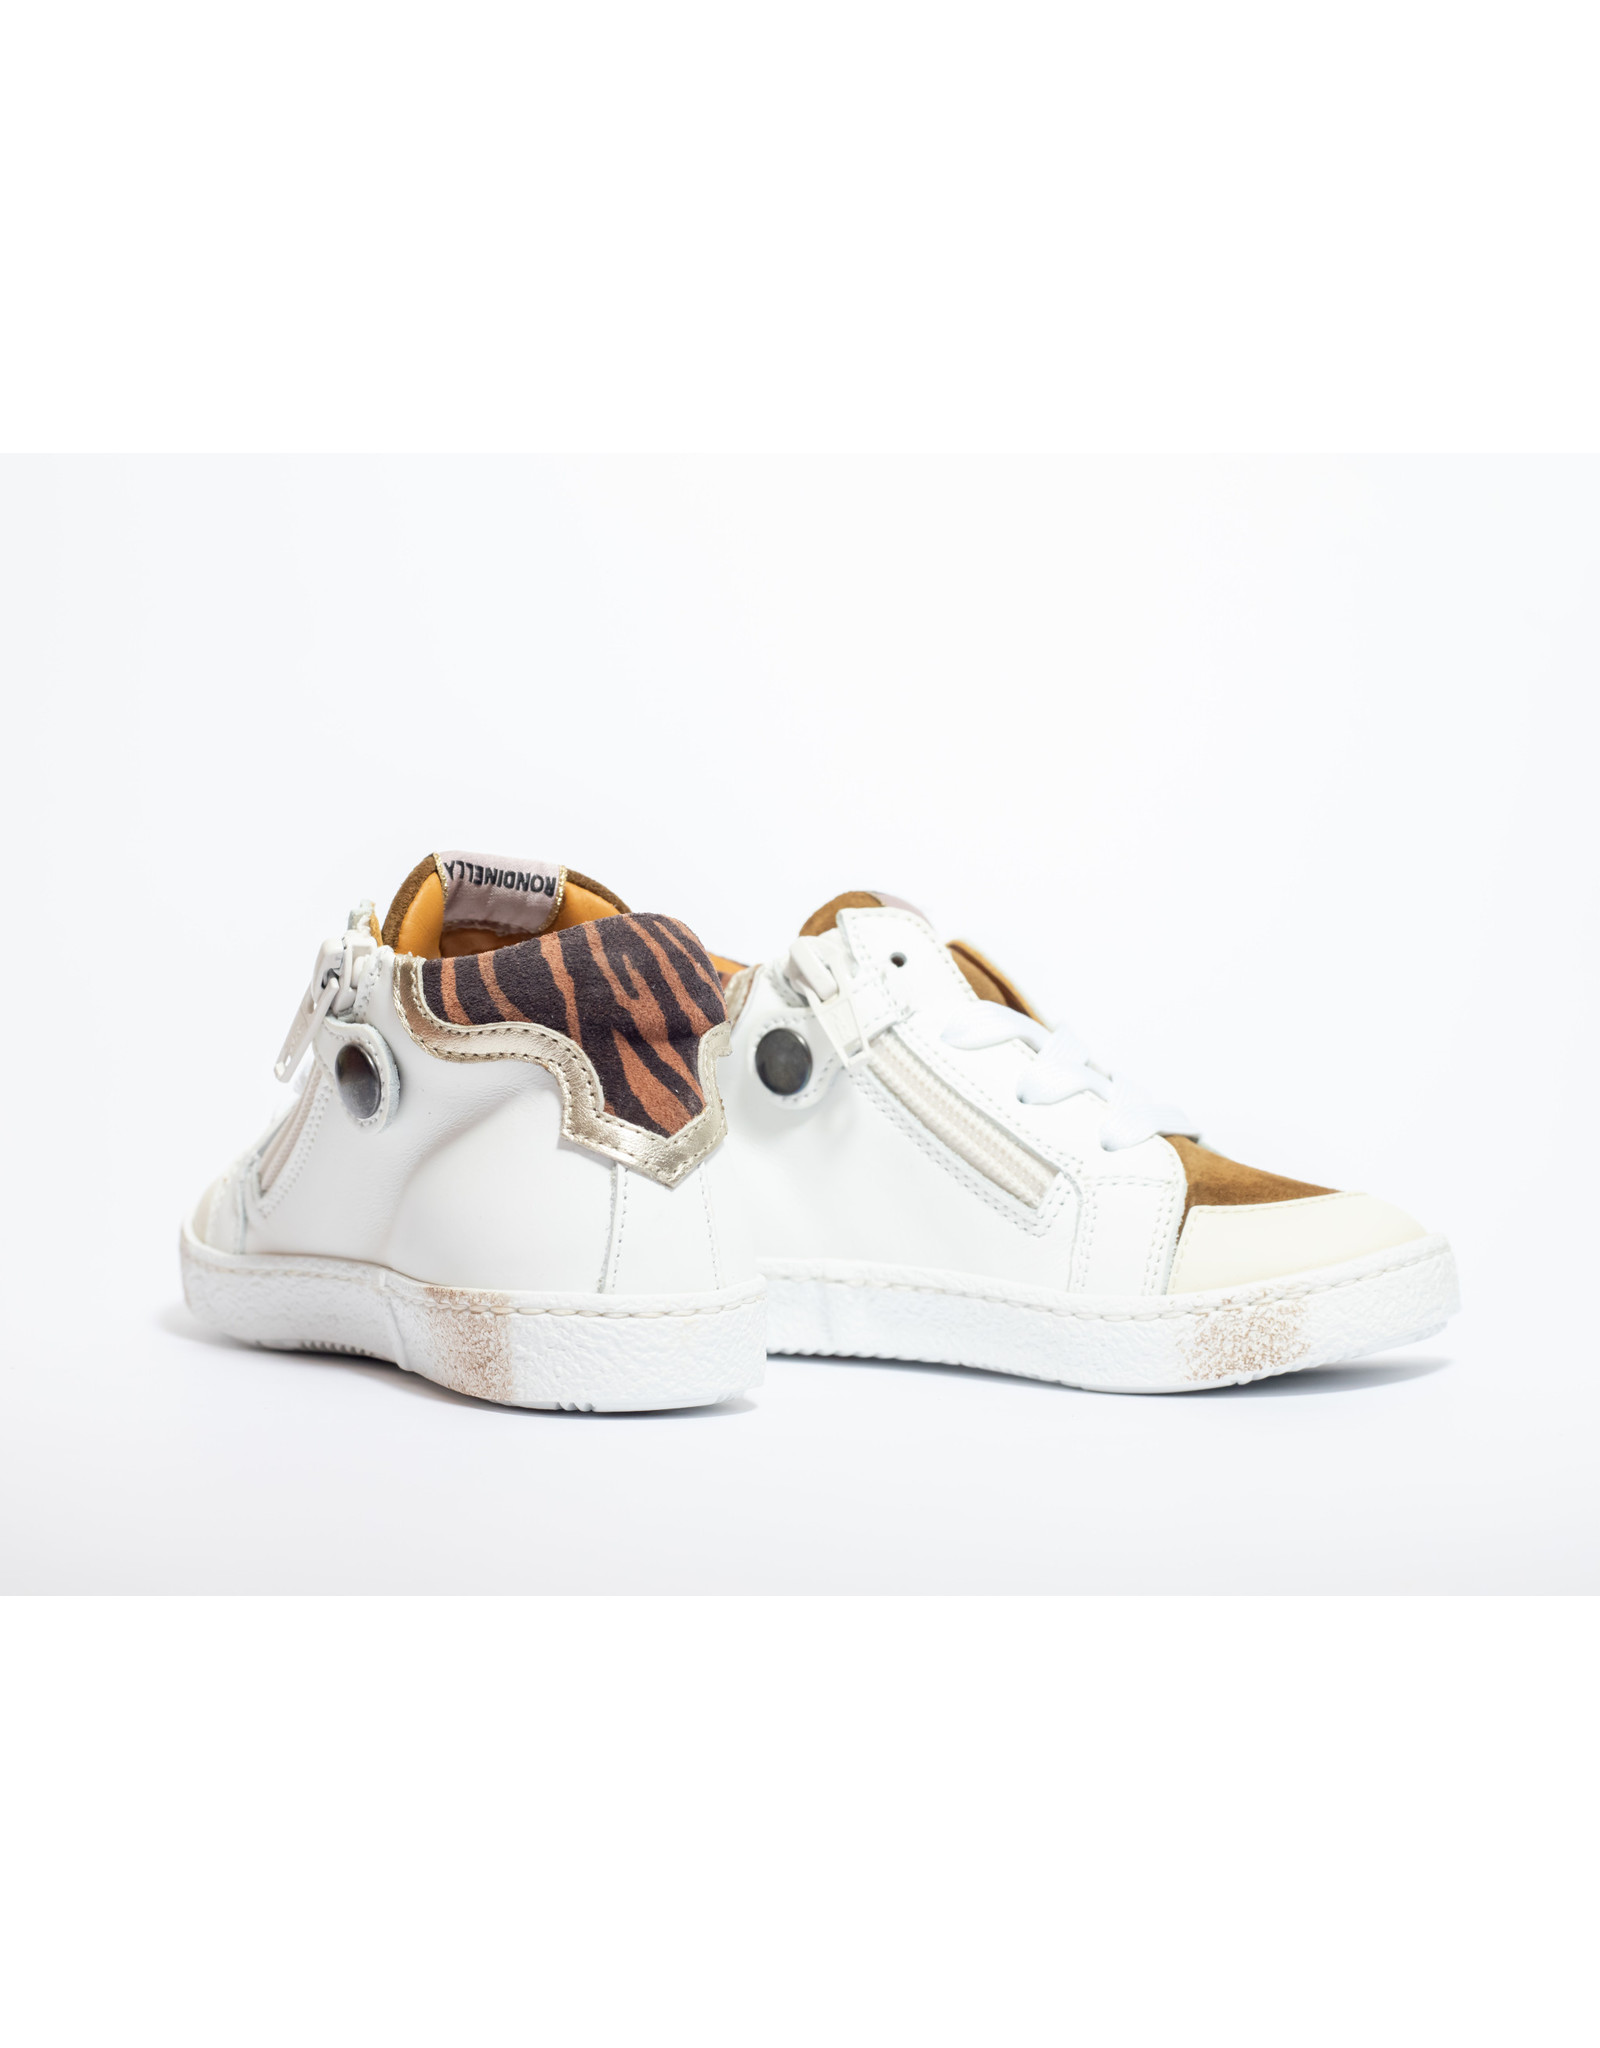 Rondinella sneaker wit/bruin ster